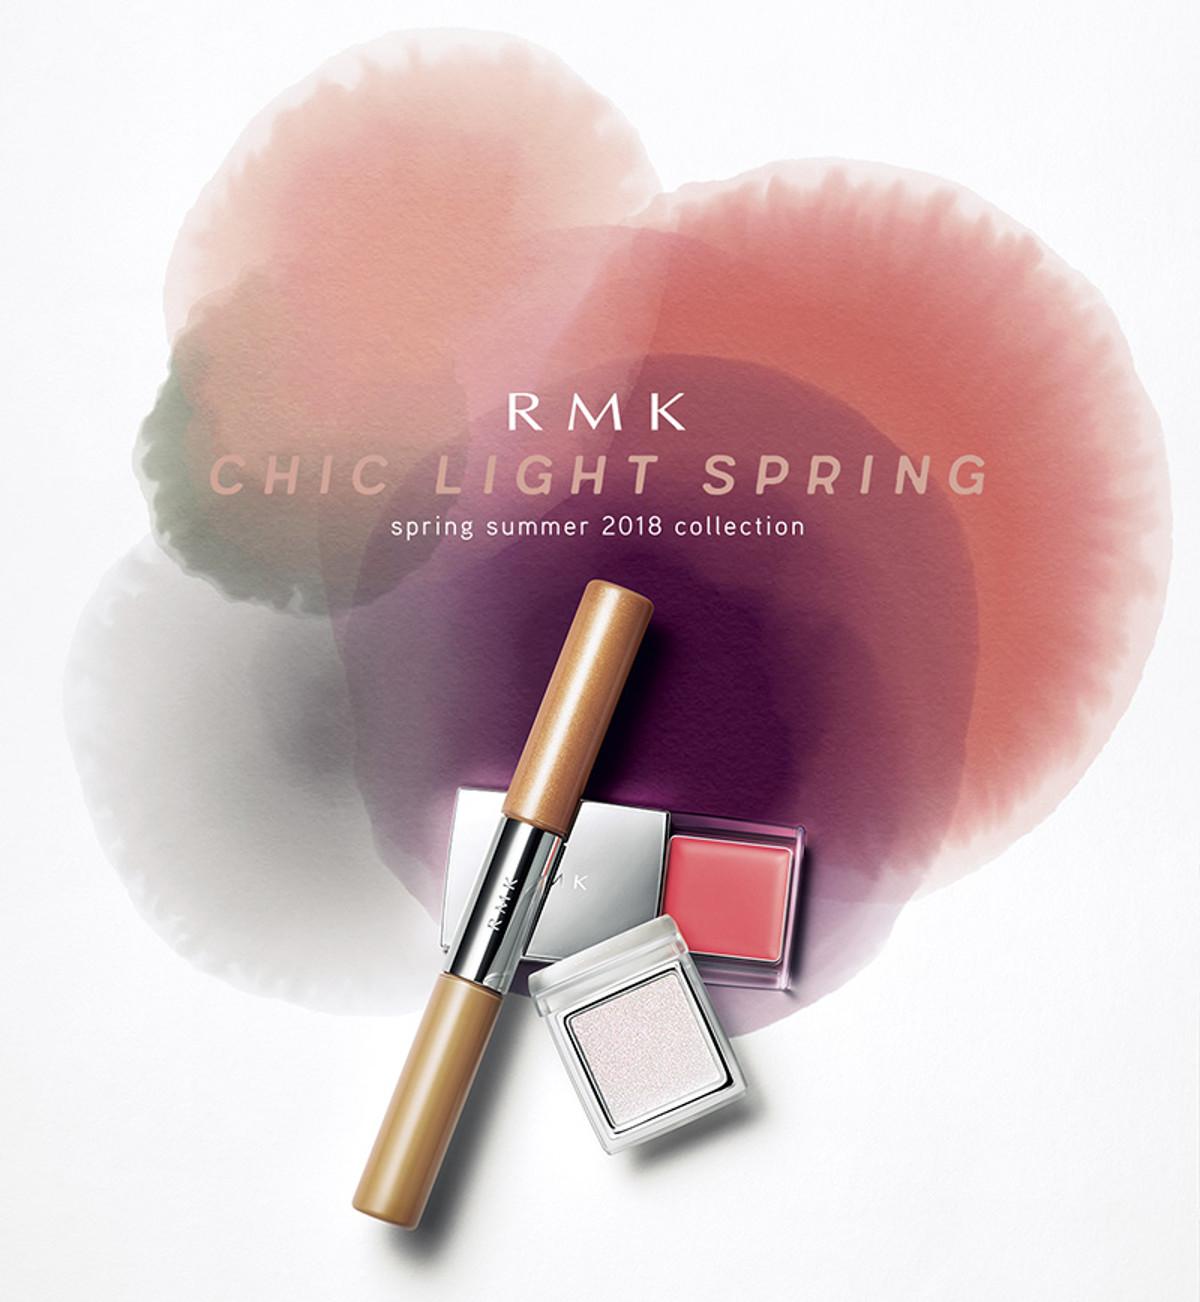 RMK 2018 Spring Summer Collection Chic Light Spring